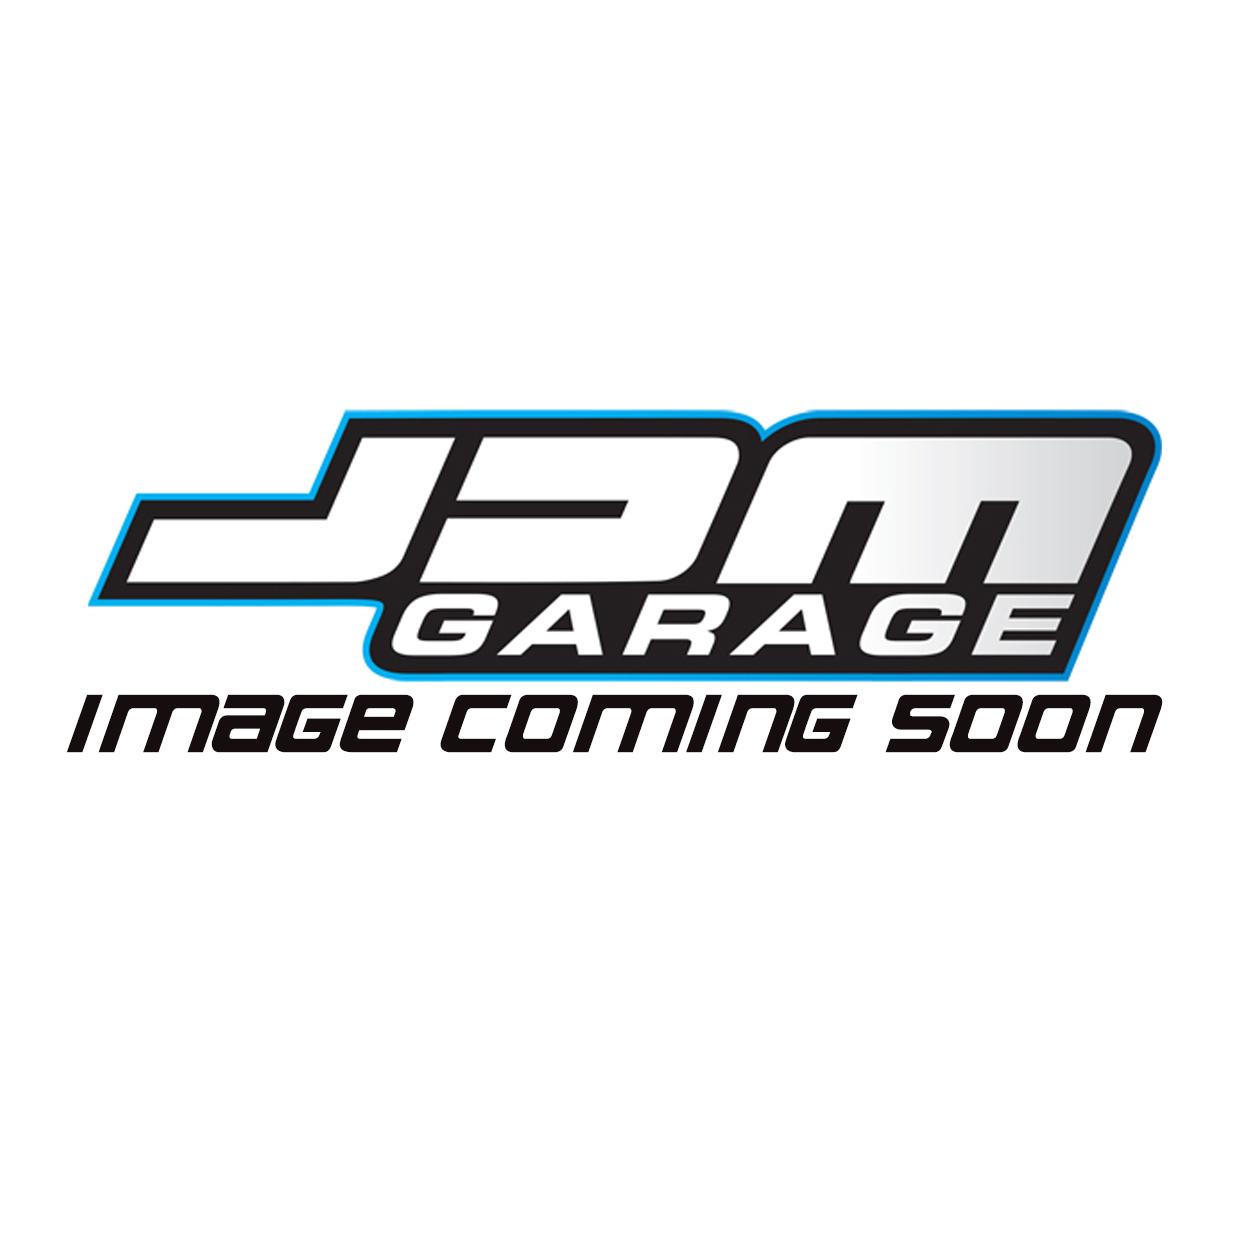 Toyota Chaser JZX100 Mark 2 1JZ-GTE Engine